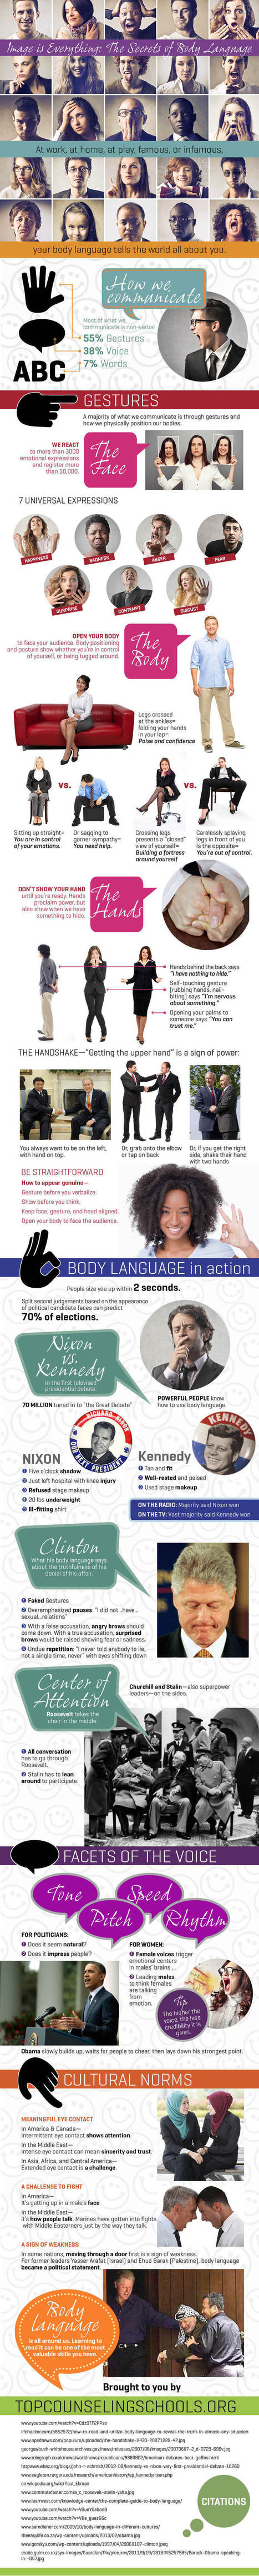 The Secrets of Body Language Infographic - Best Infographics | Digital-News on Scoop.it today | Scoop.it